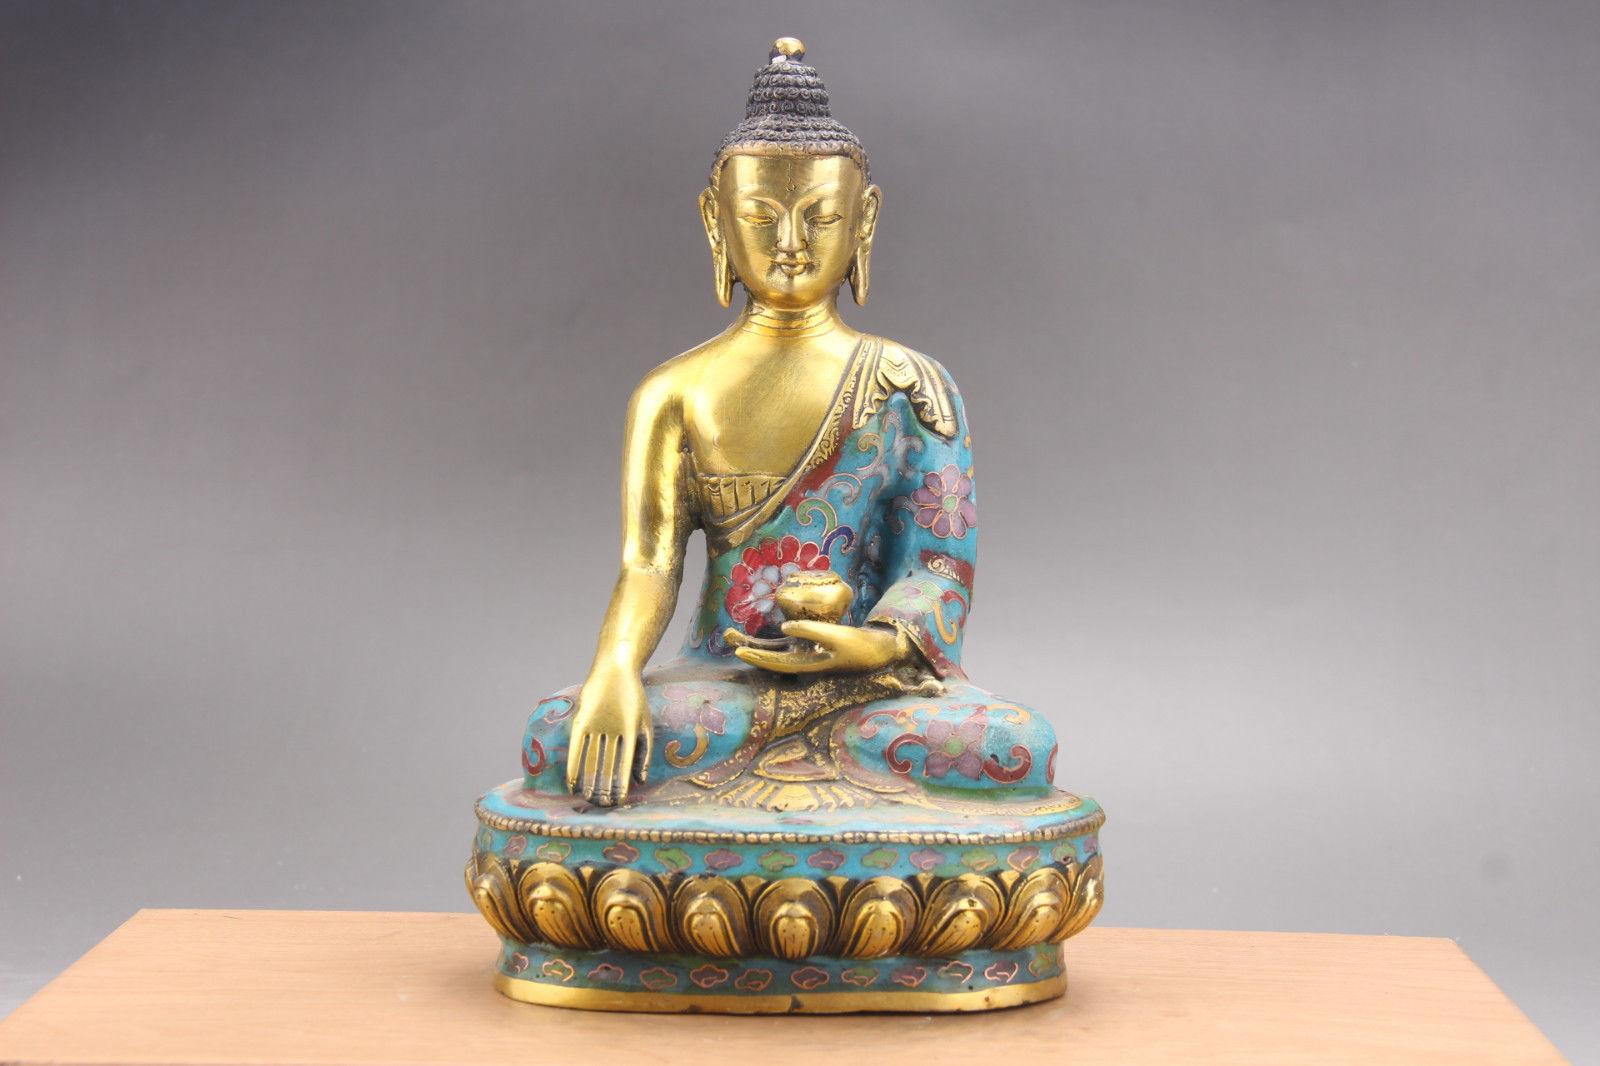 Handcarved Deity Joss Buddha Statue Collectable Figurine Christmas Xmas Gift